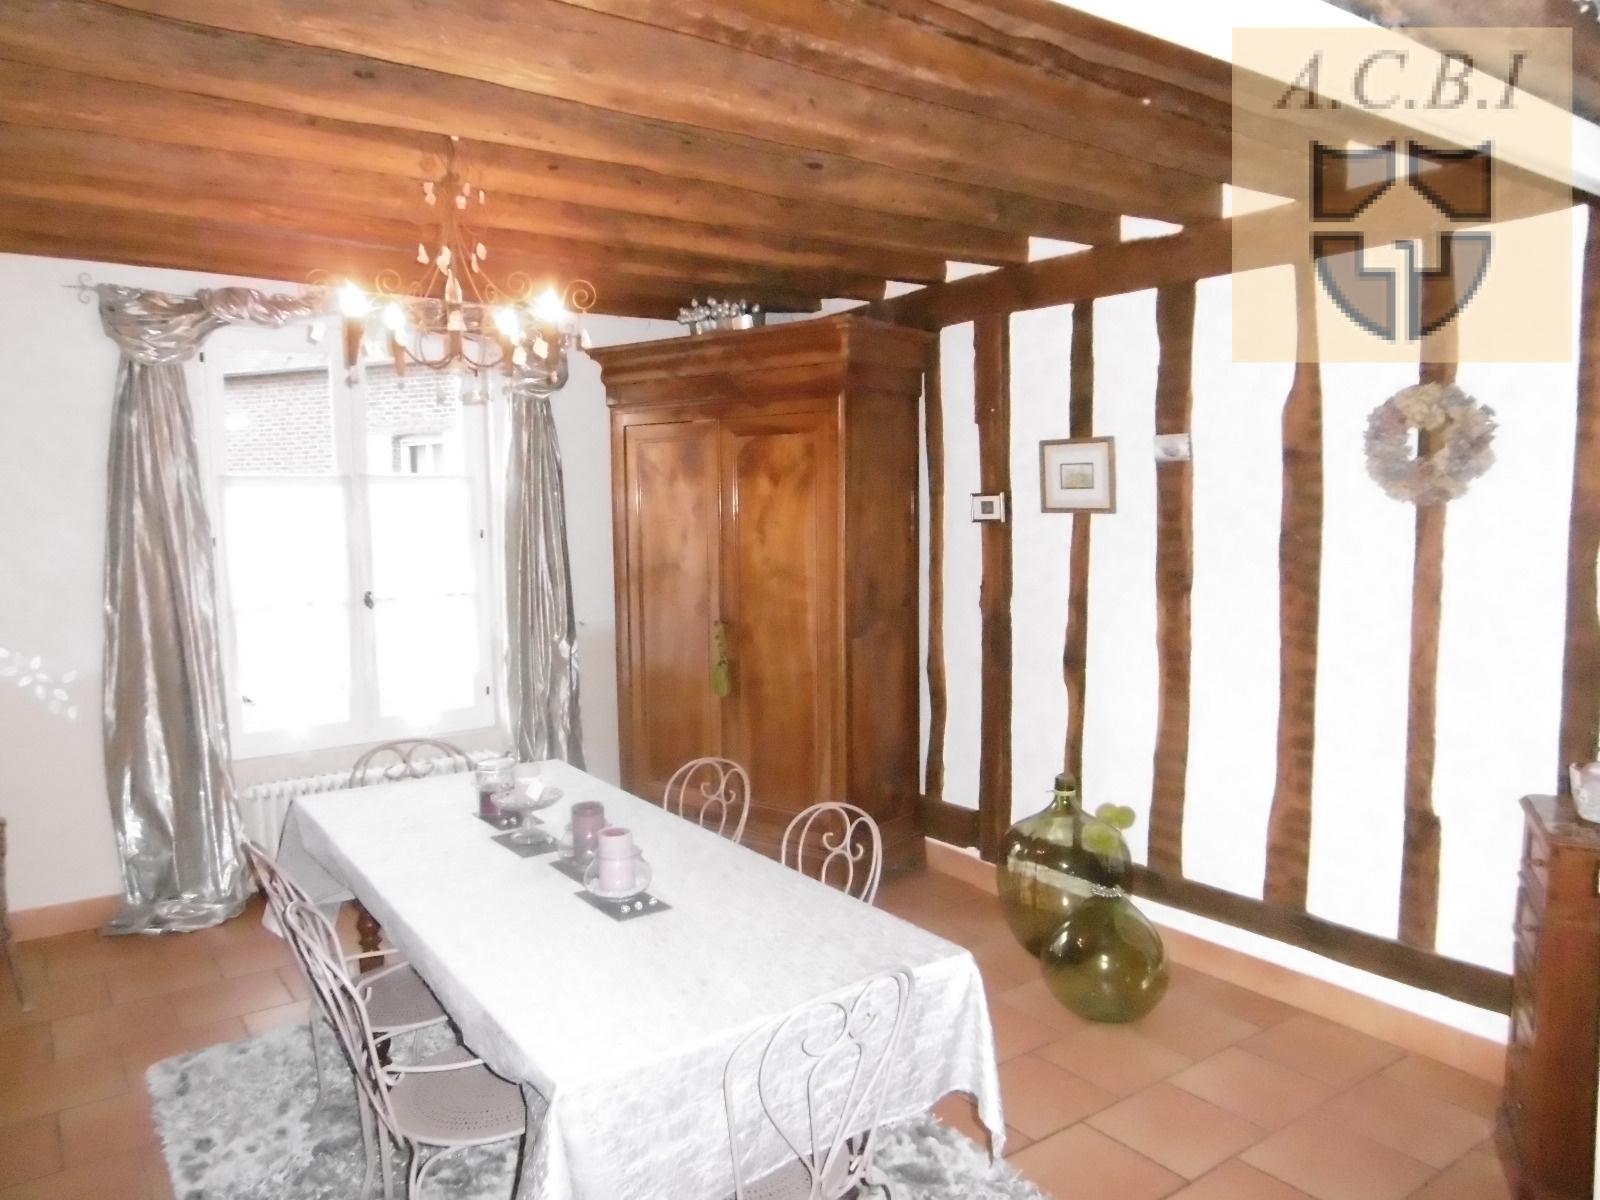 vente maison de bourg restauree 15 min vendome gare tgv. Black Bedroom Furniture Sets. Home Design Ideas